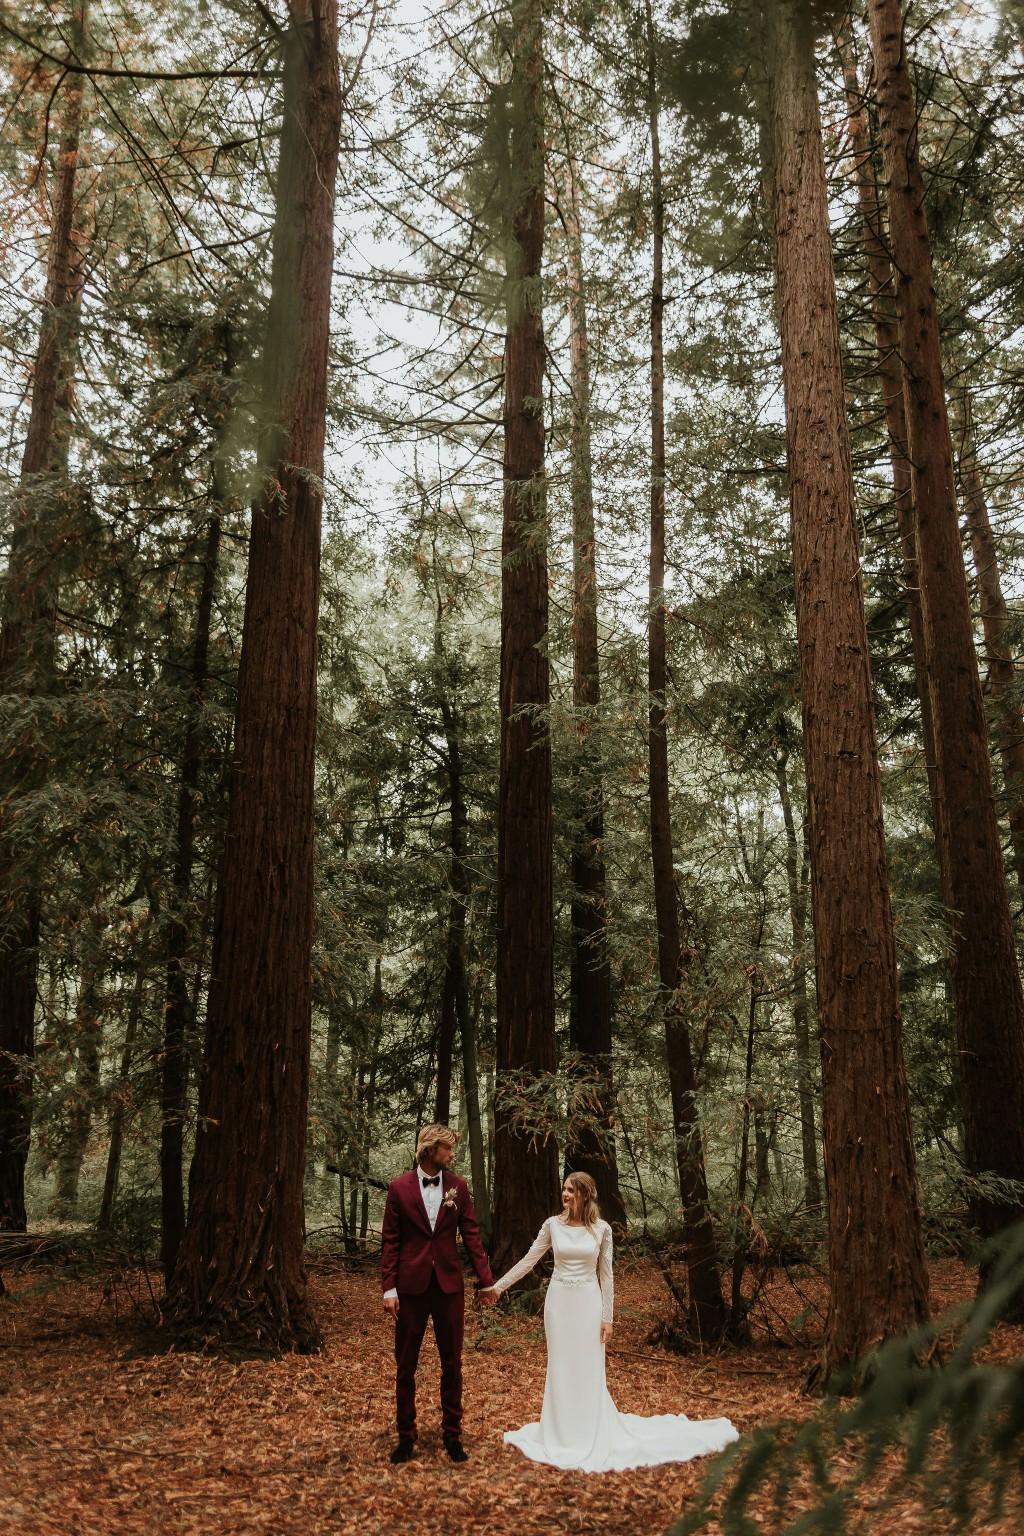 modern woodland wedding - autumn outdoor wedding - modern elopement photos - burgundy grooms suit and elegant wedding dress